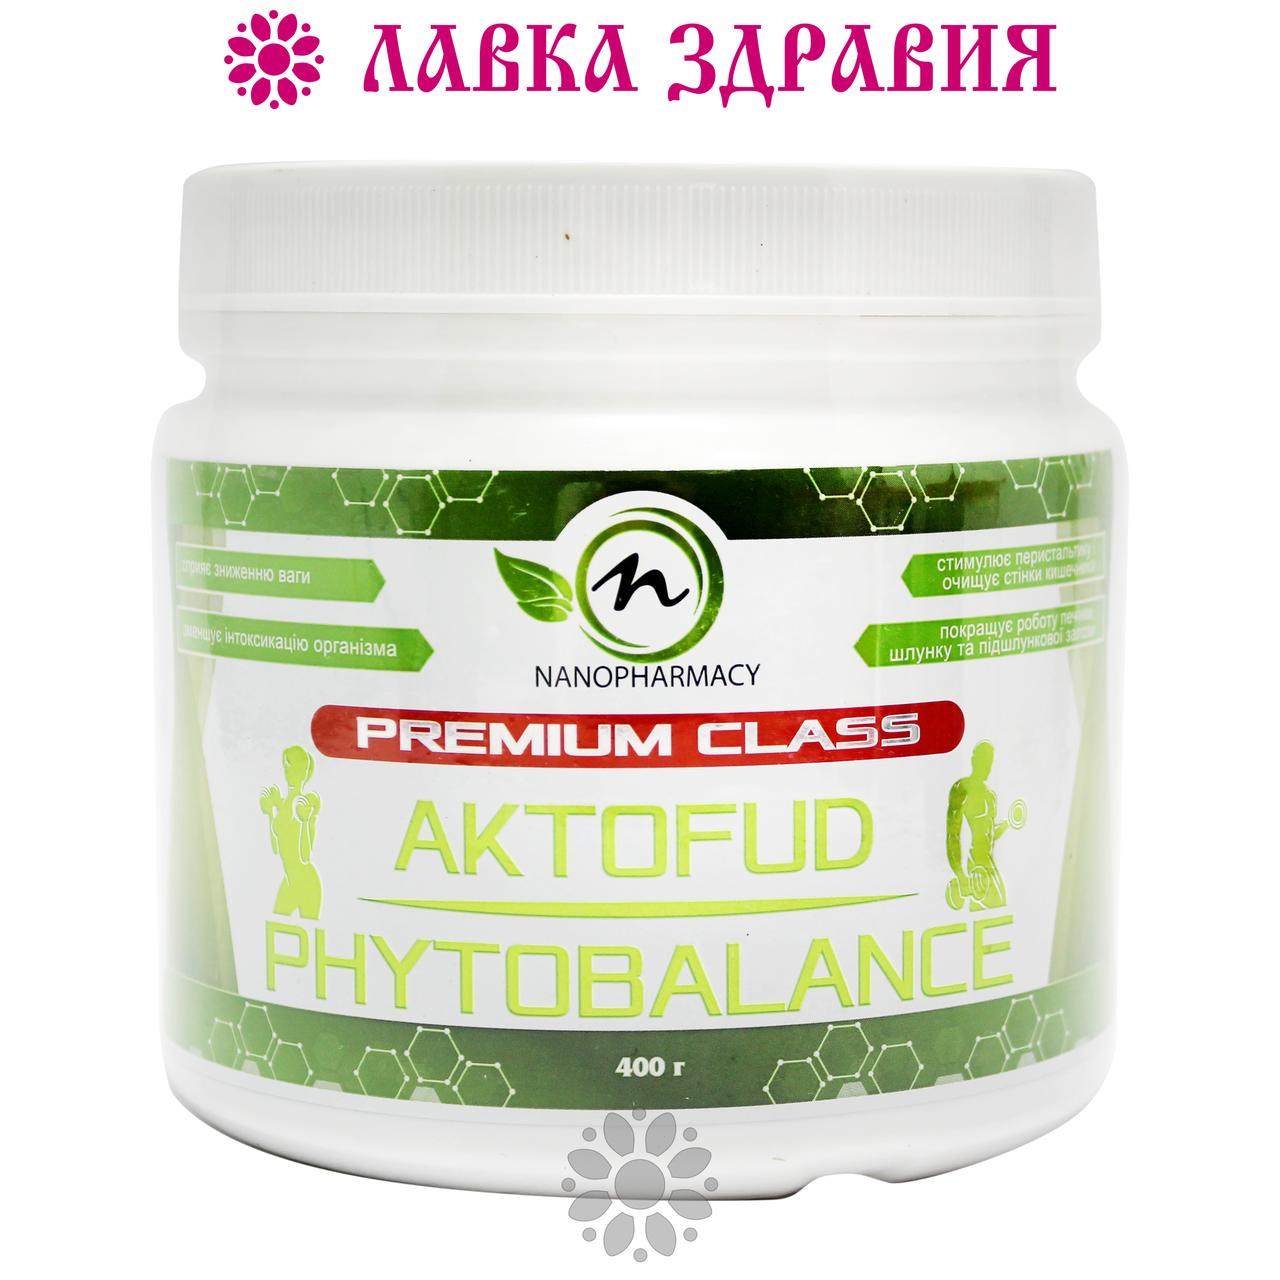 Aktofud Phytobalance, 400 г, Нанофармация